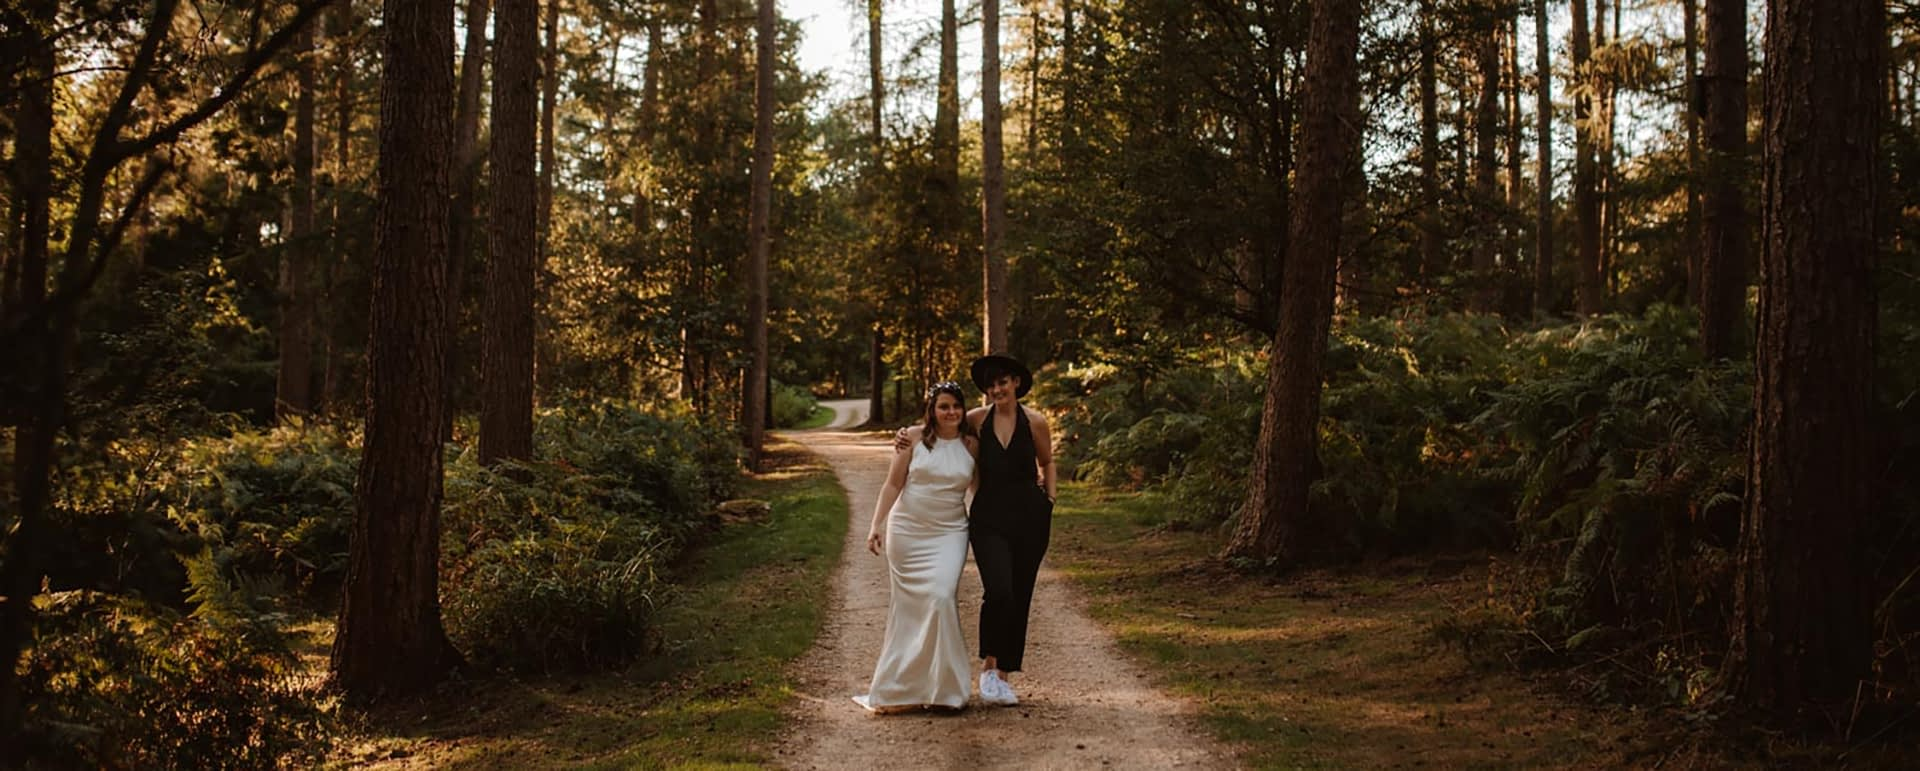 Lydia & Steph's GreenAcres Wedding